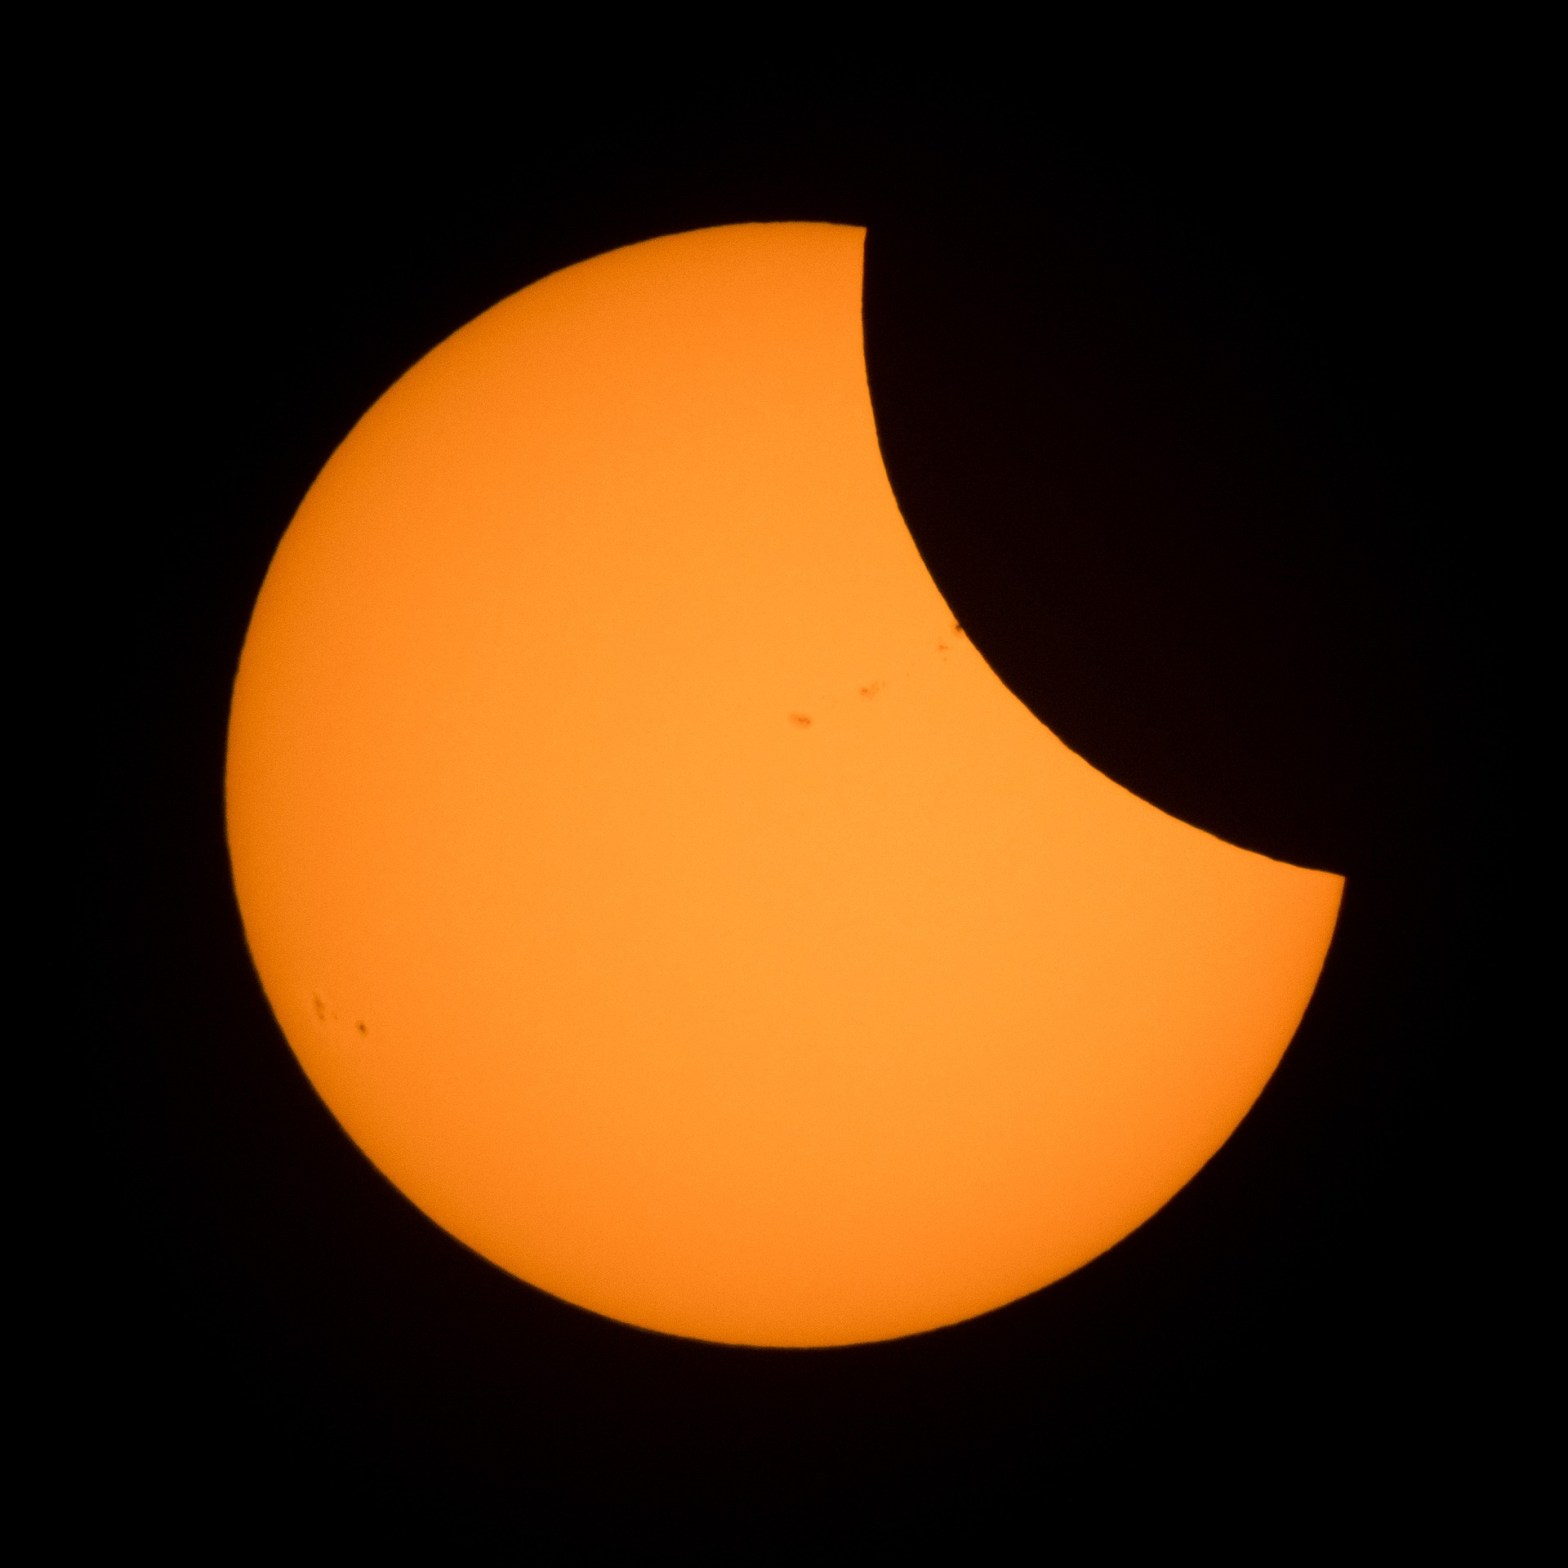 2017 Eclipse -Courtesy Pixabay